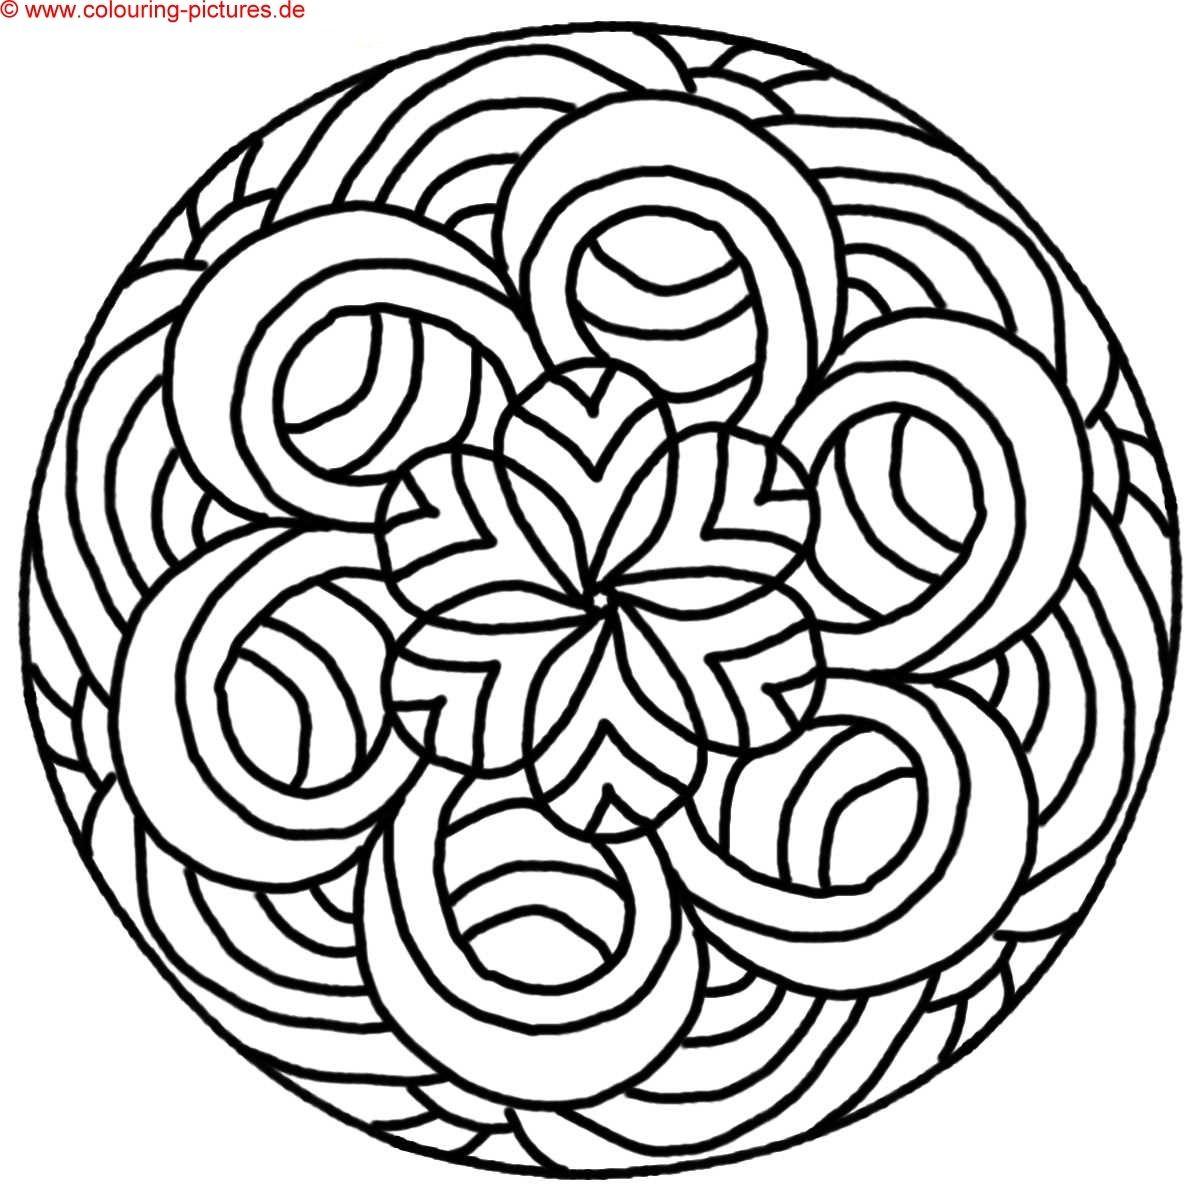 Mandala Malvorlage | ausmalbilder | Pinterest